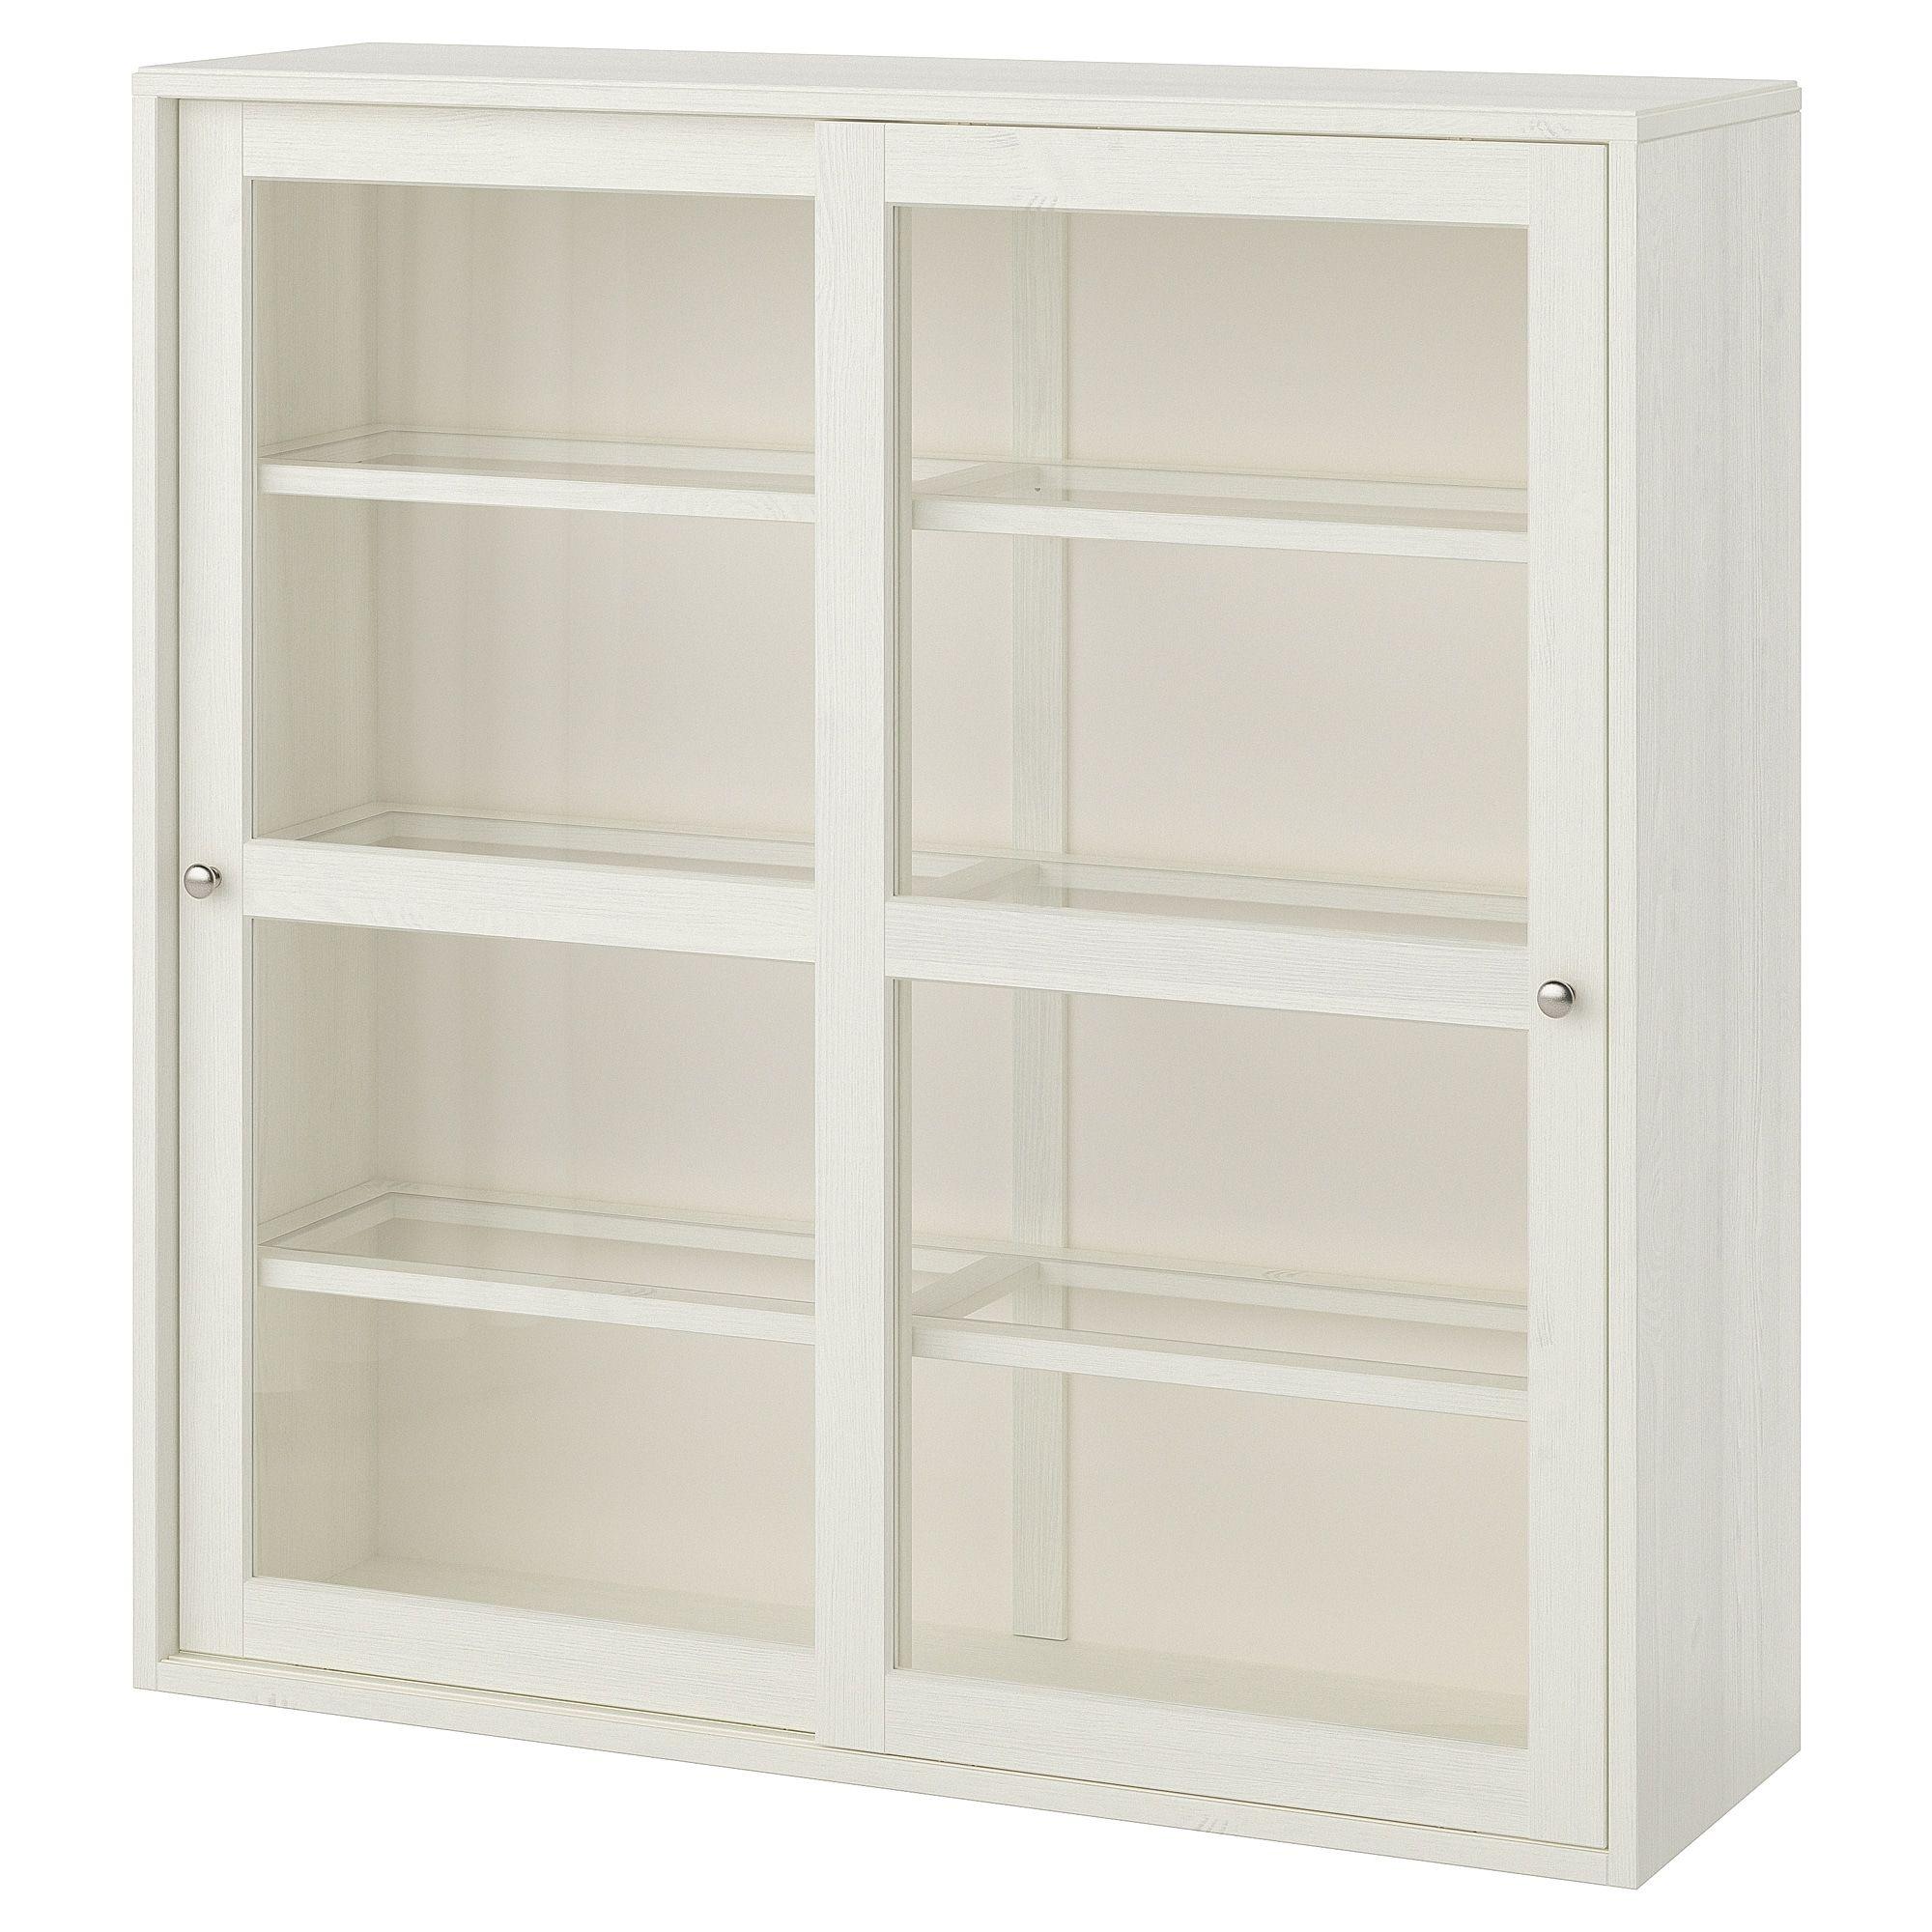 HAVSTA Glassdoor white 47 5/8x13 3/4x48 3/8